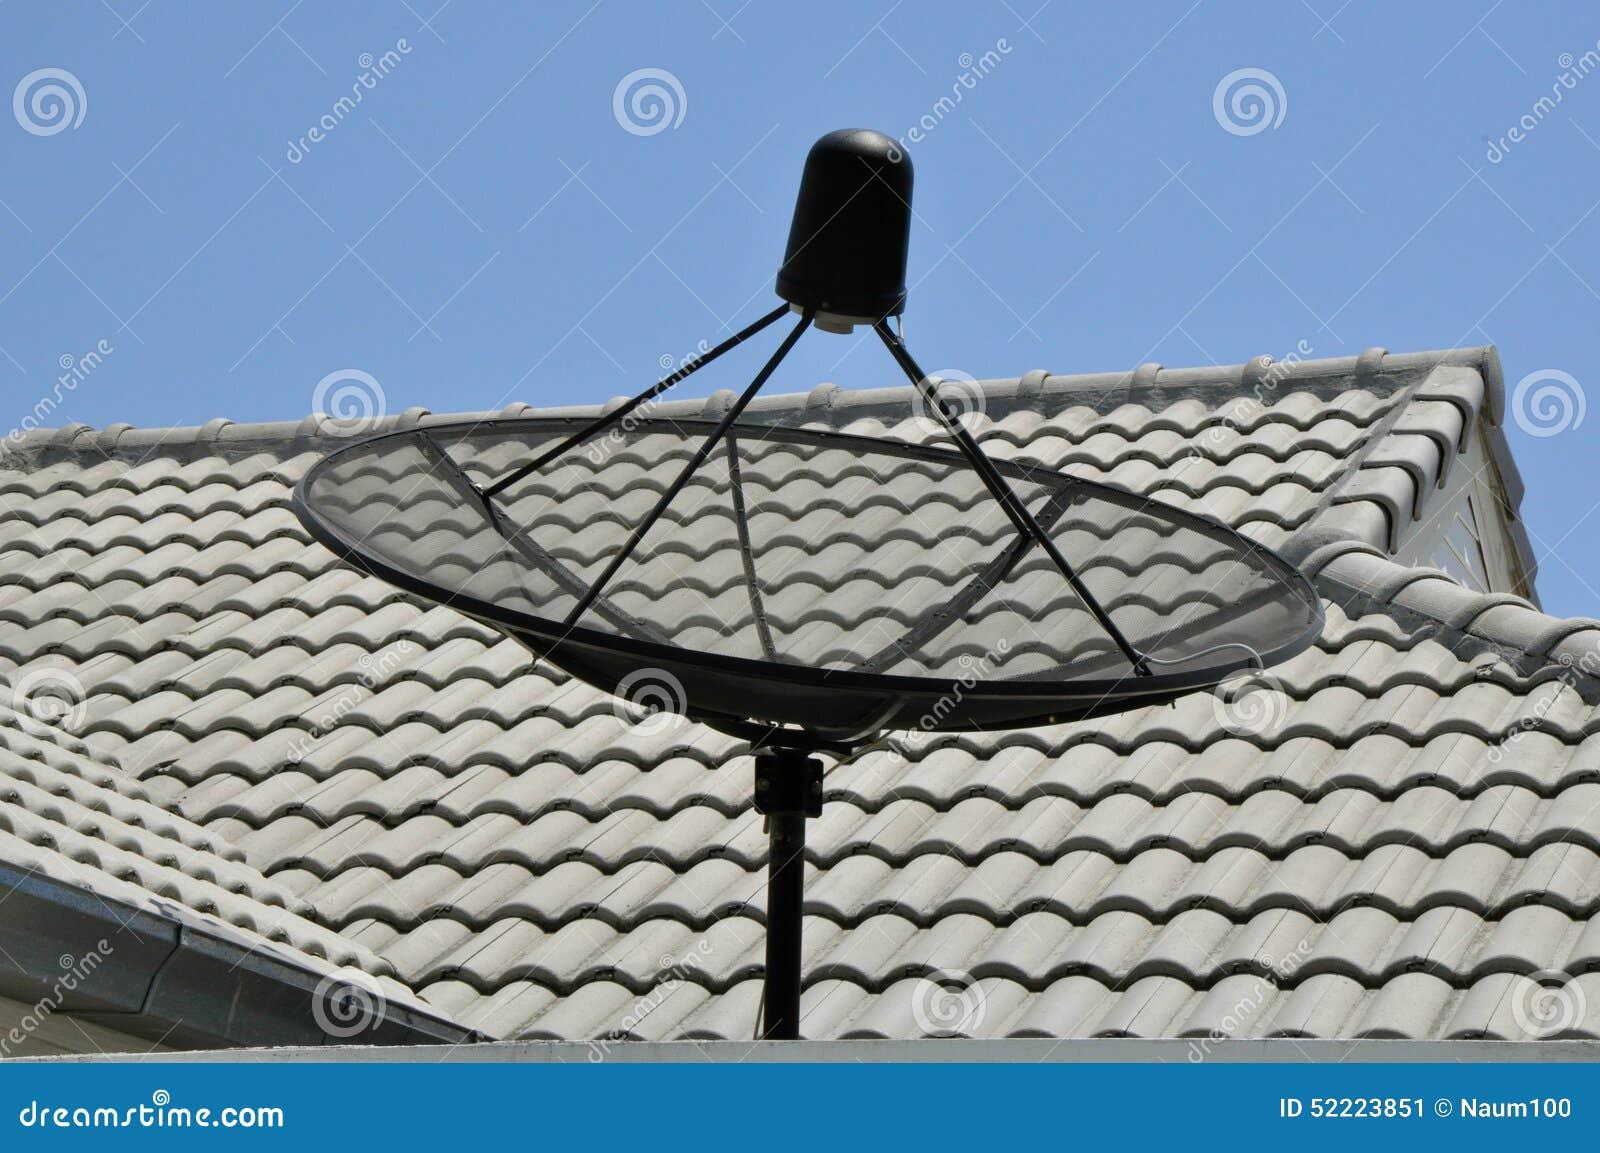 Satellite Dish On The Roof Stock Photo Image 52223851